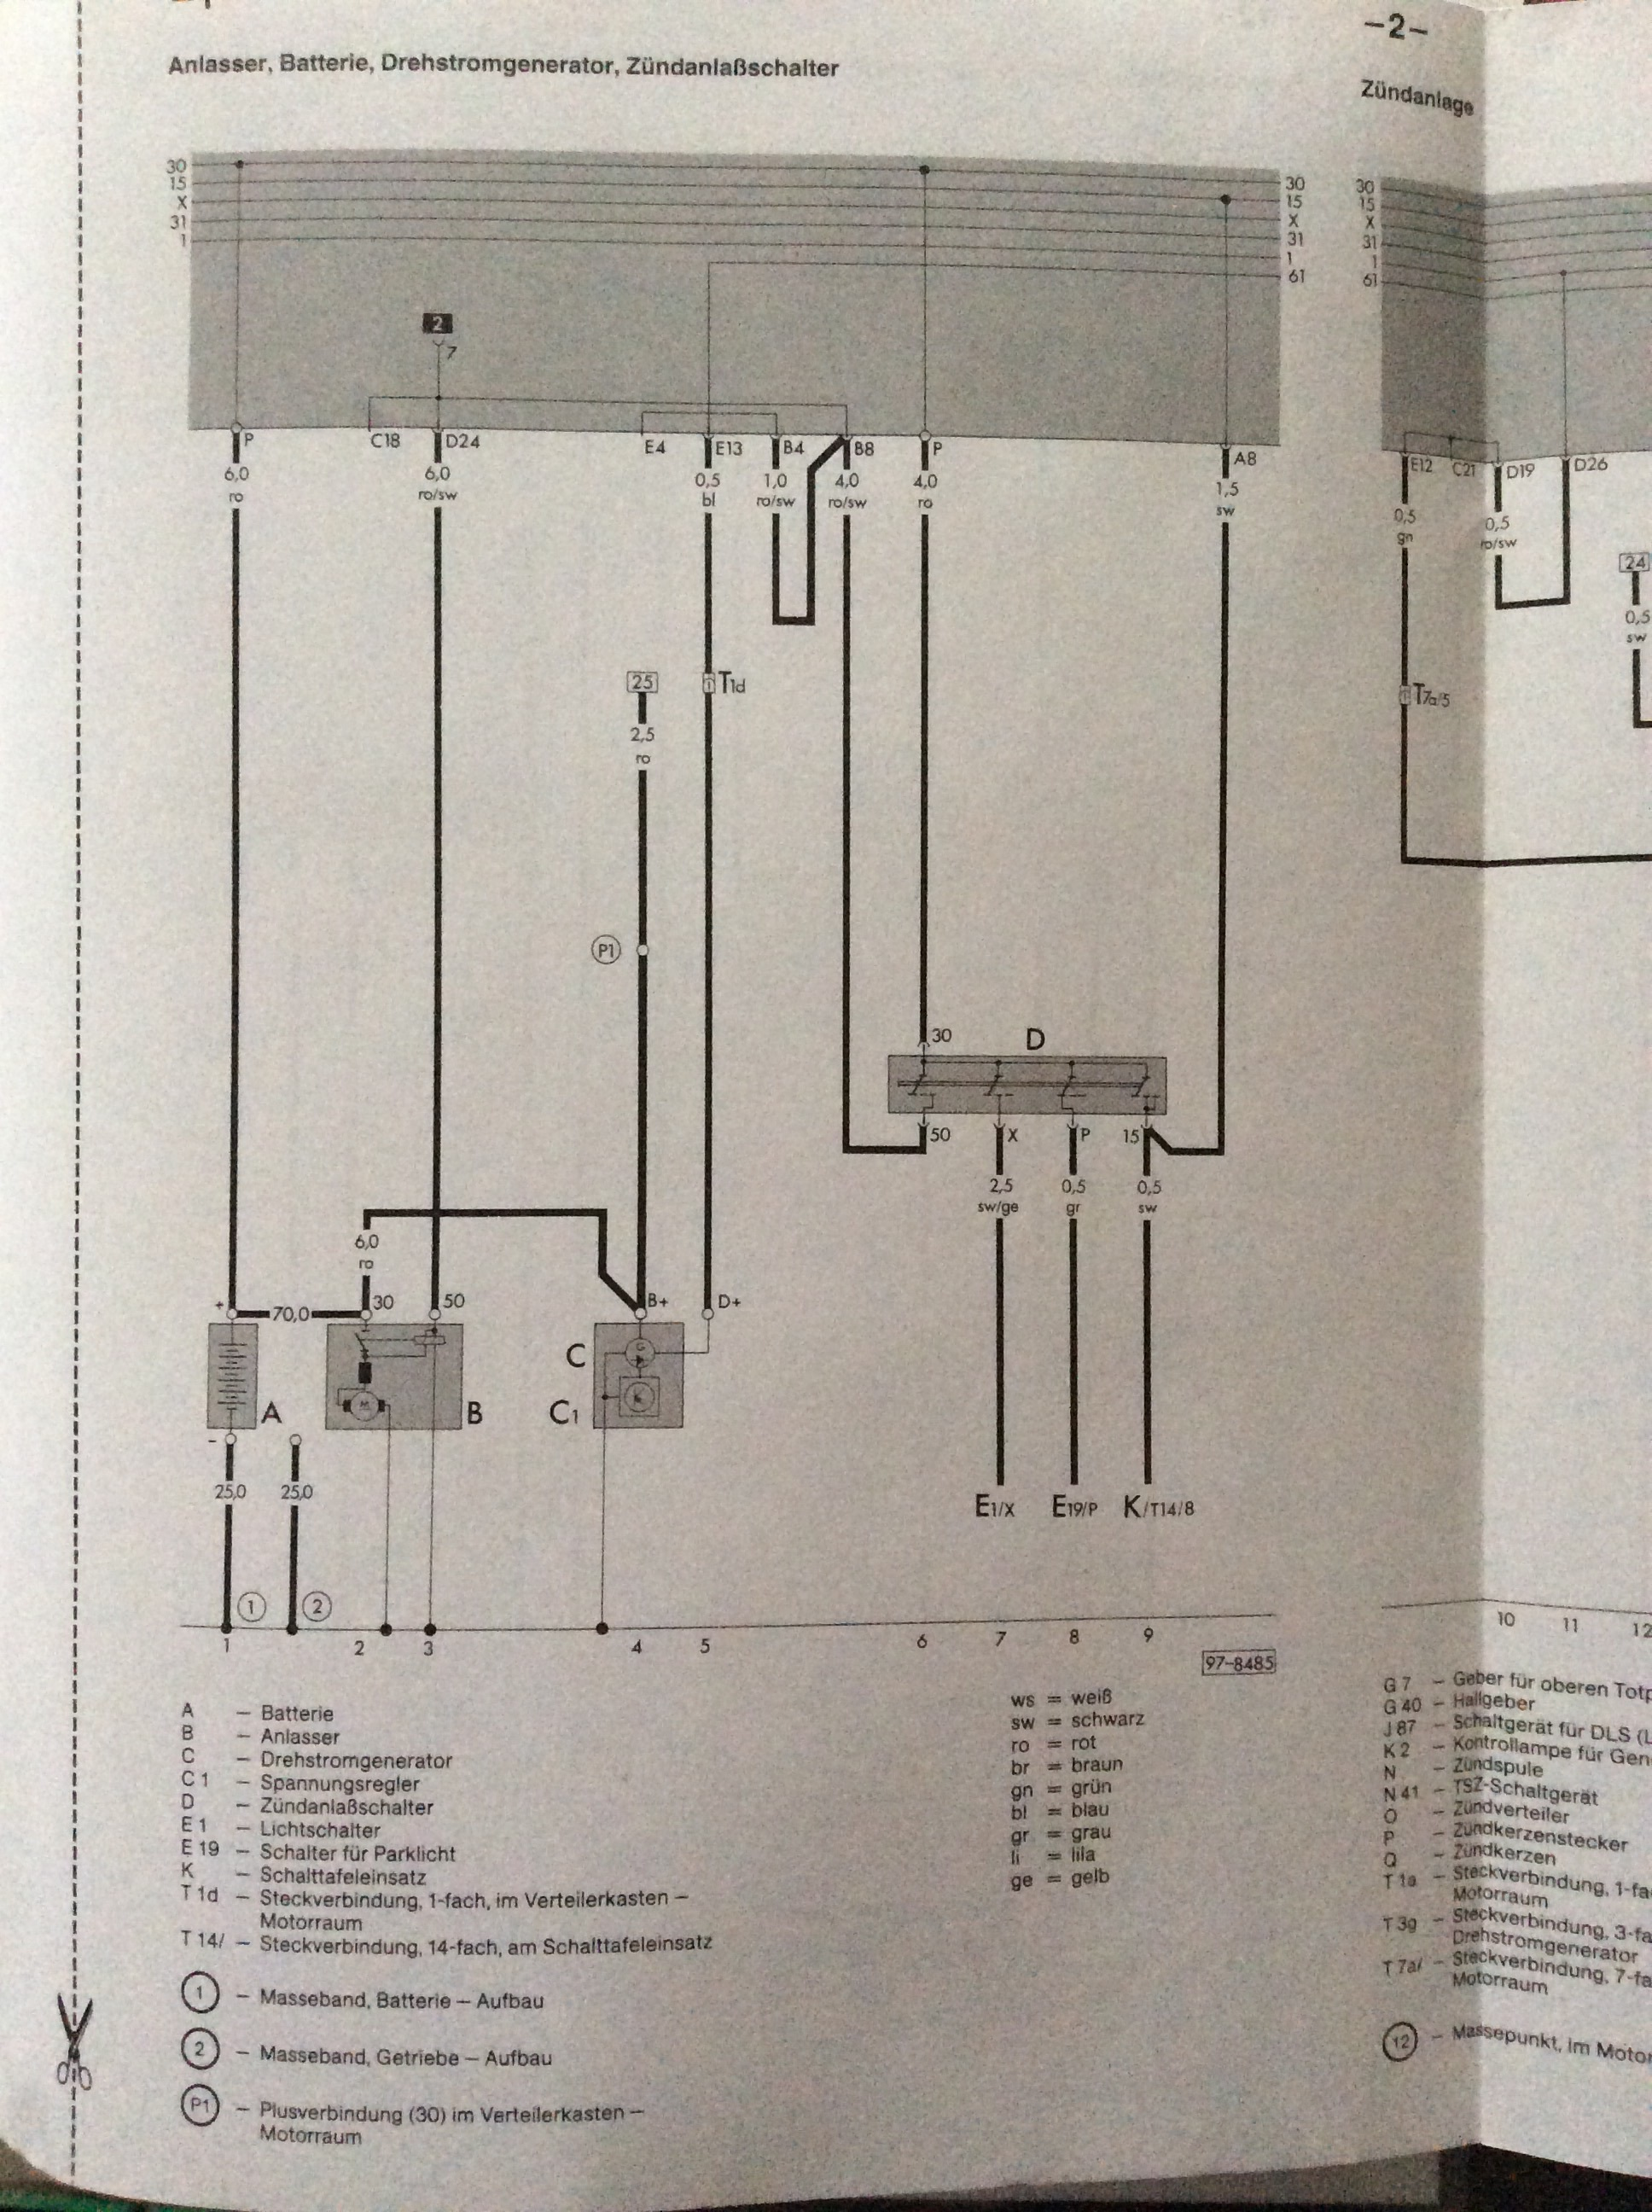 Stromlaufplan T3 Bj.1988 GESUCHT - Elektronik & Car Hifi - VWBUSFORUM.CH